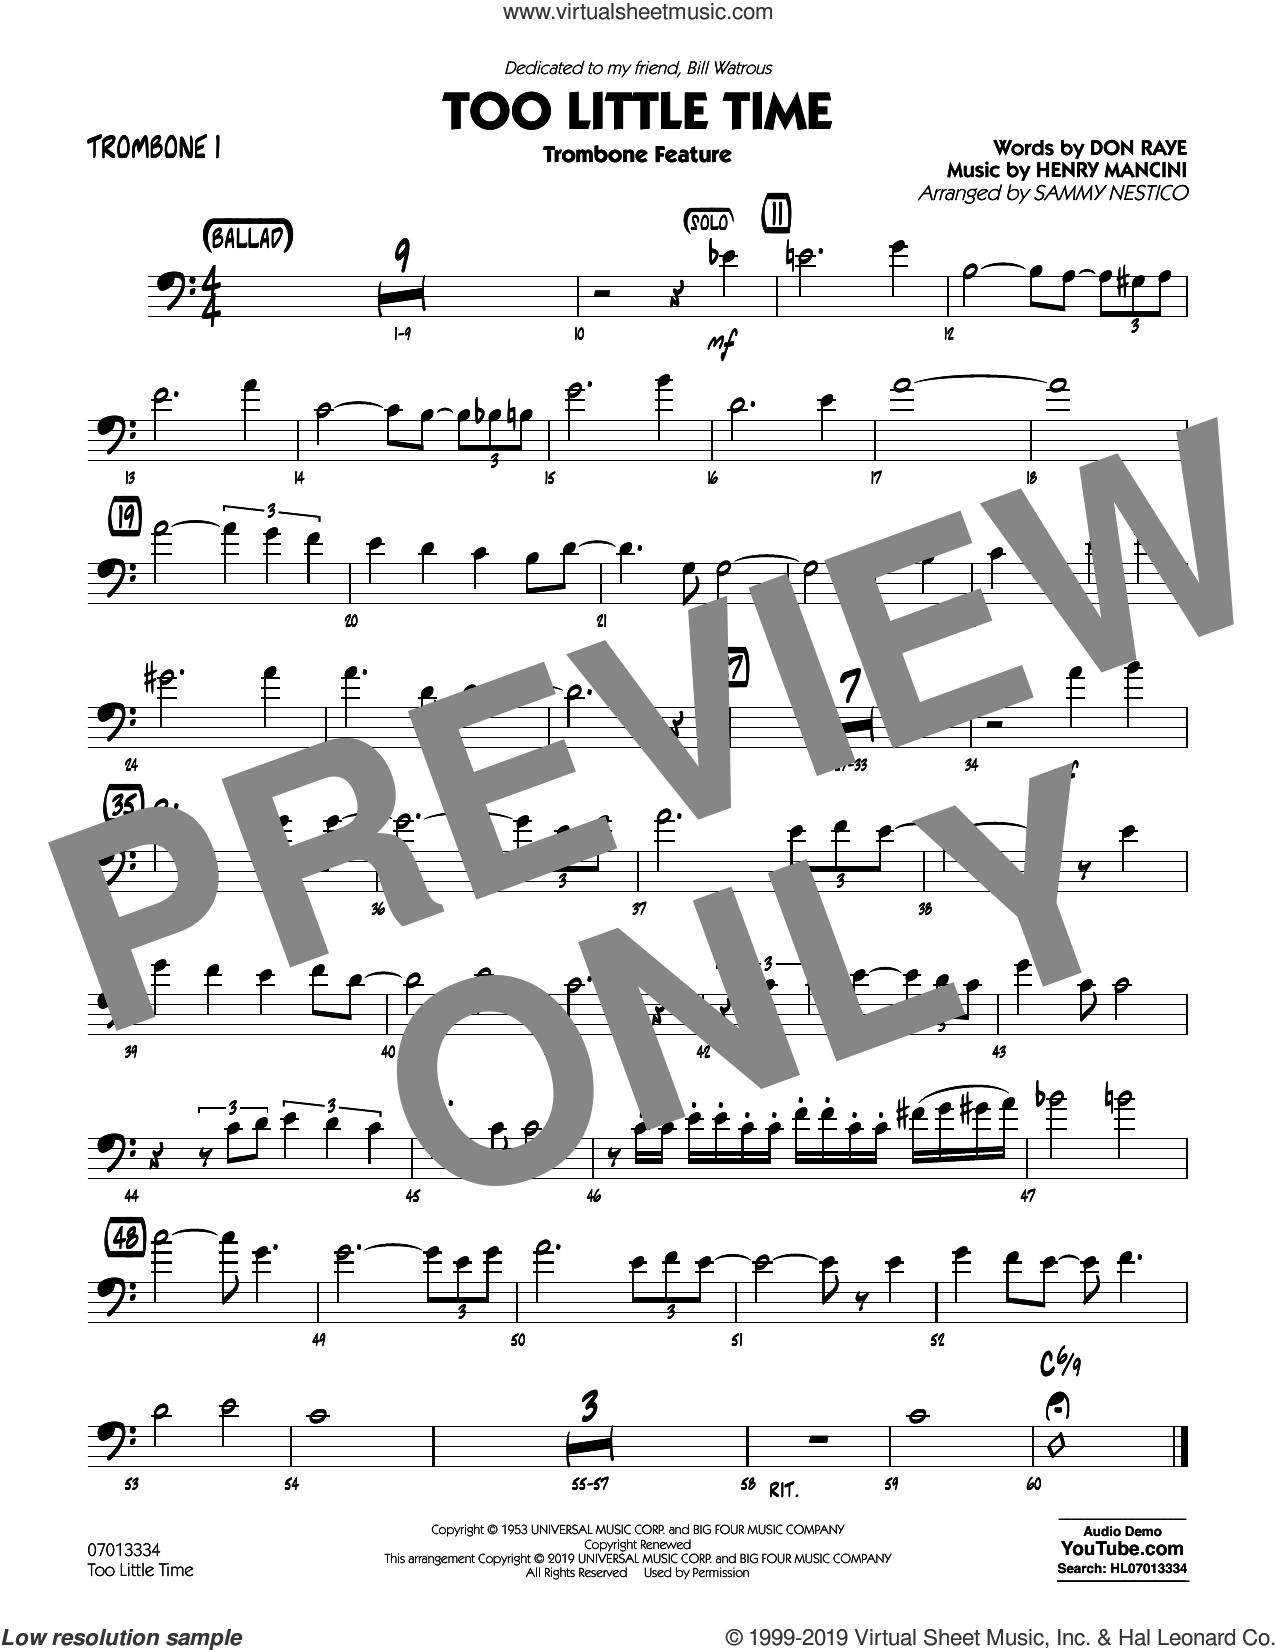 Too Little Time (arr. Sammy Nestico), conductor score (full score) sheet music for jazz band (trombone 1) by Henry Mancini, Sammy Nestico, Bill Watrous and Don Raye, intermediate skill level